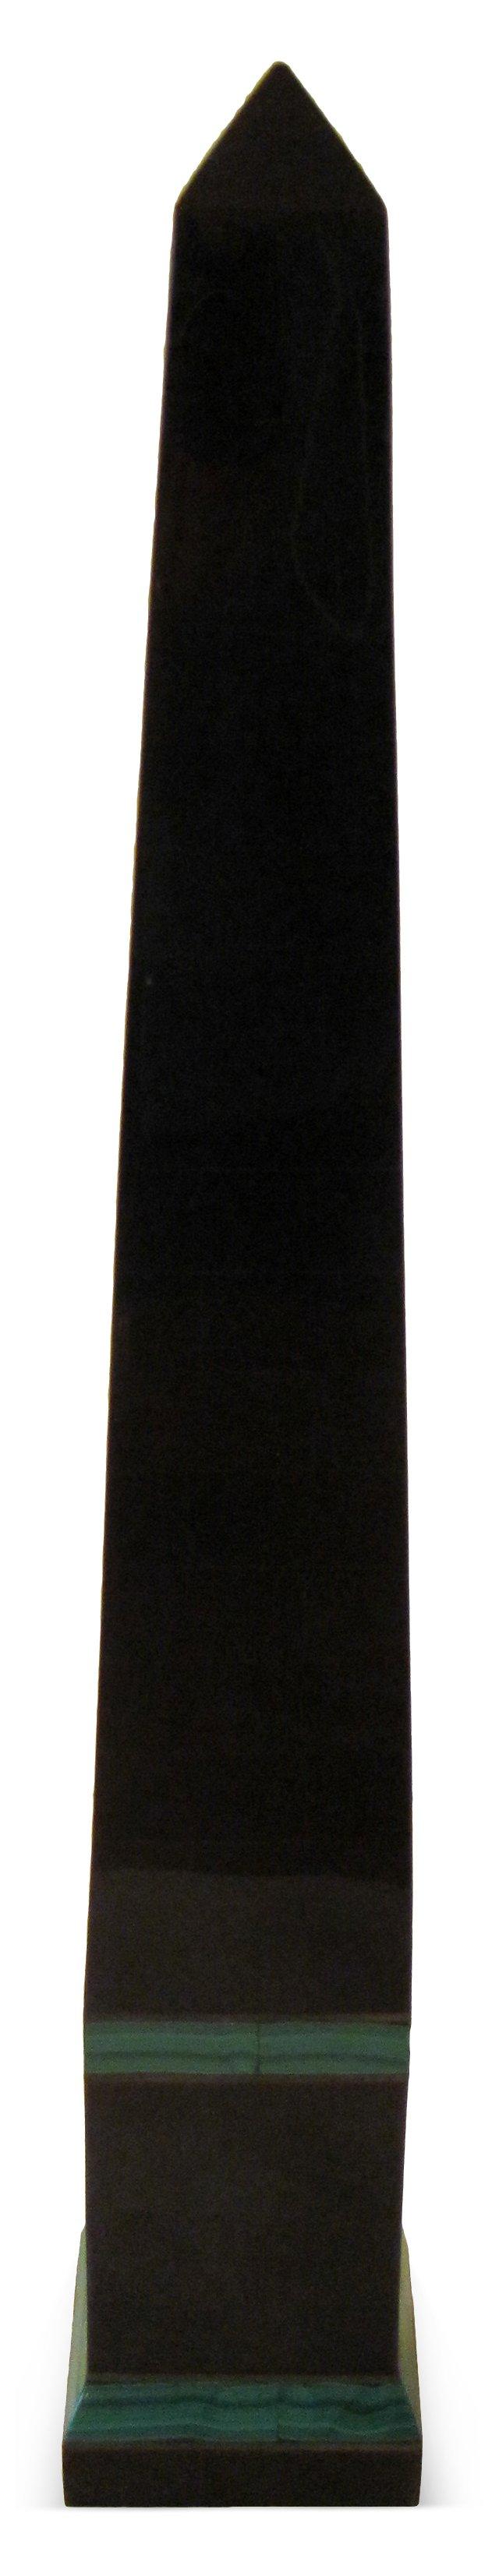 Black Stone Obelisk w/ Malachite